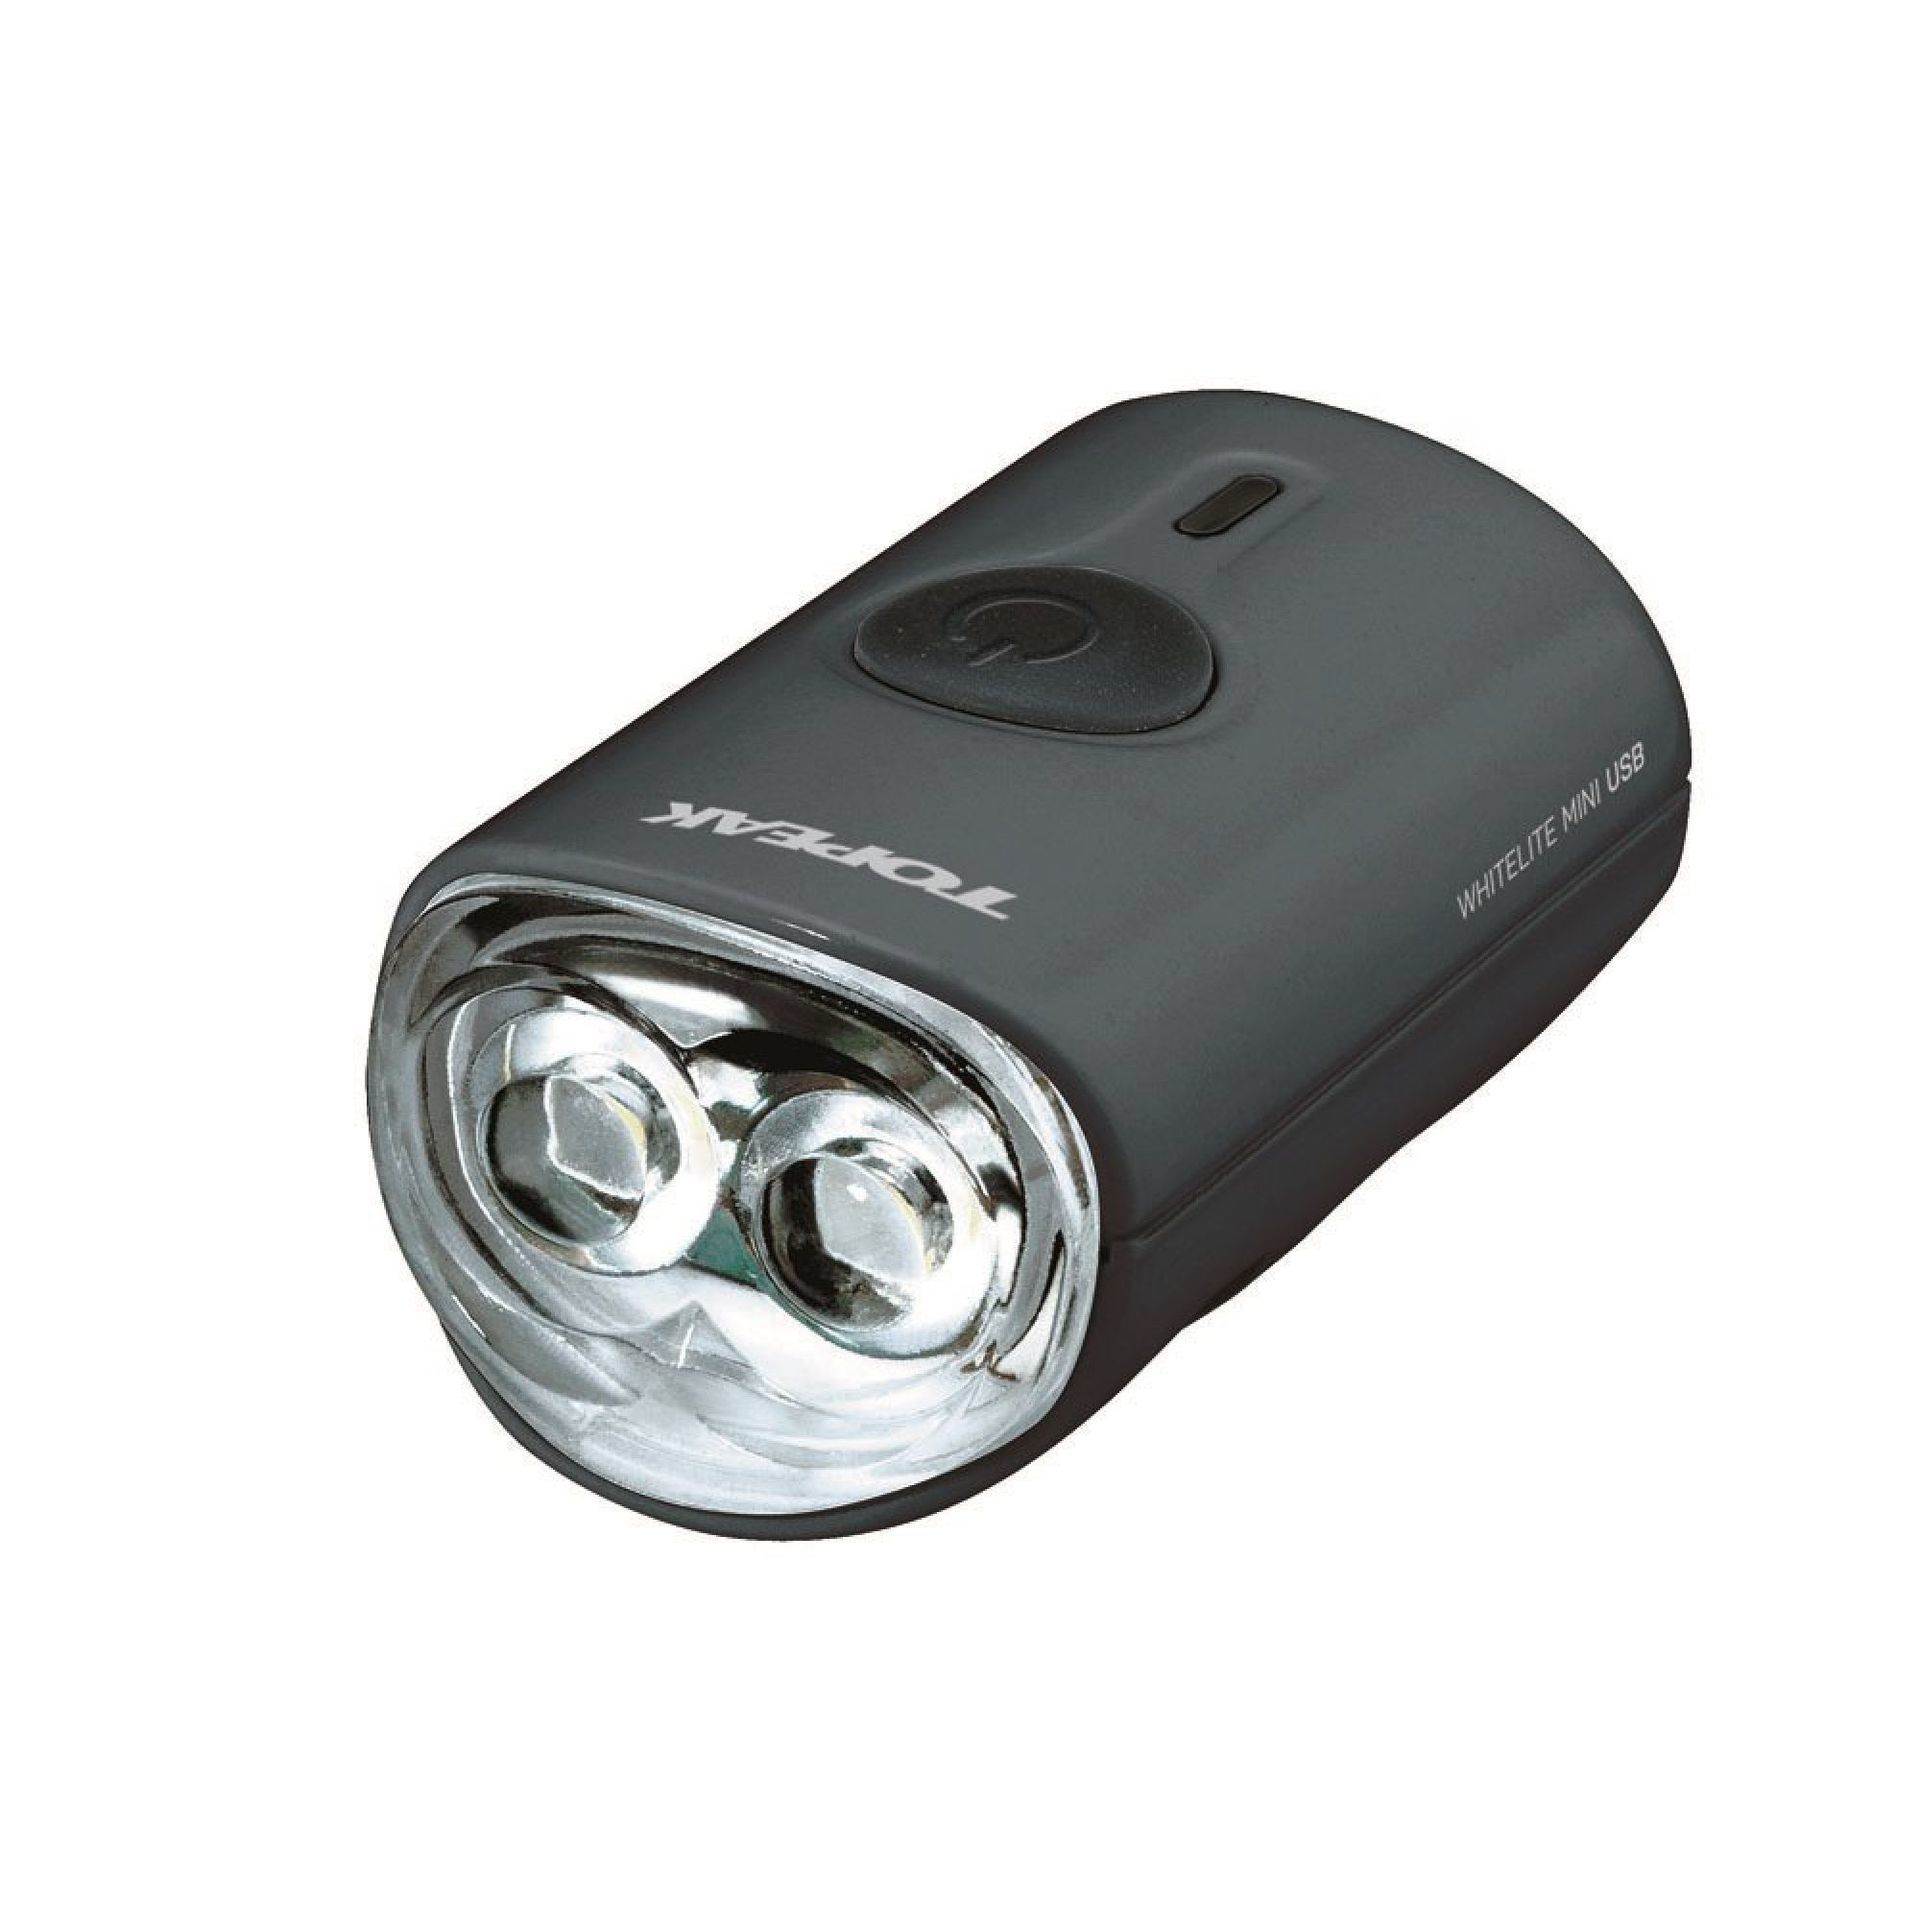 LAMPKA ROWEROWA PRZÓD TOPEAK WHITE LITE MINI USB